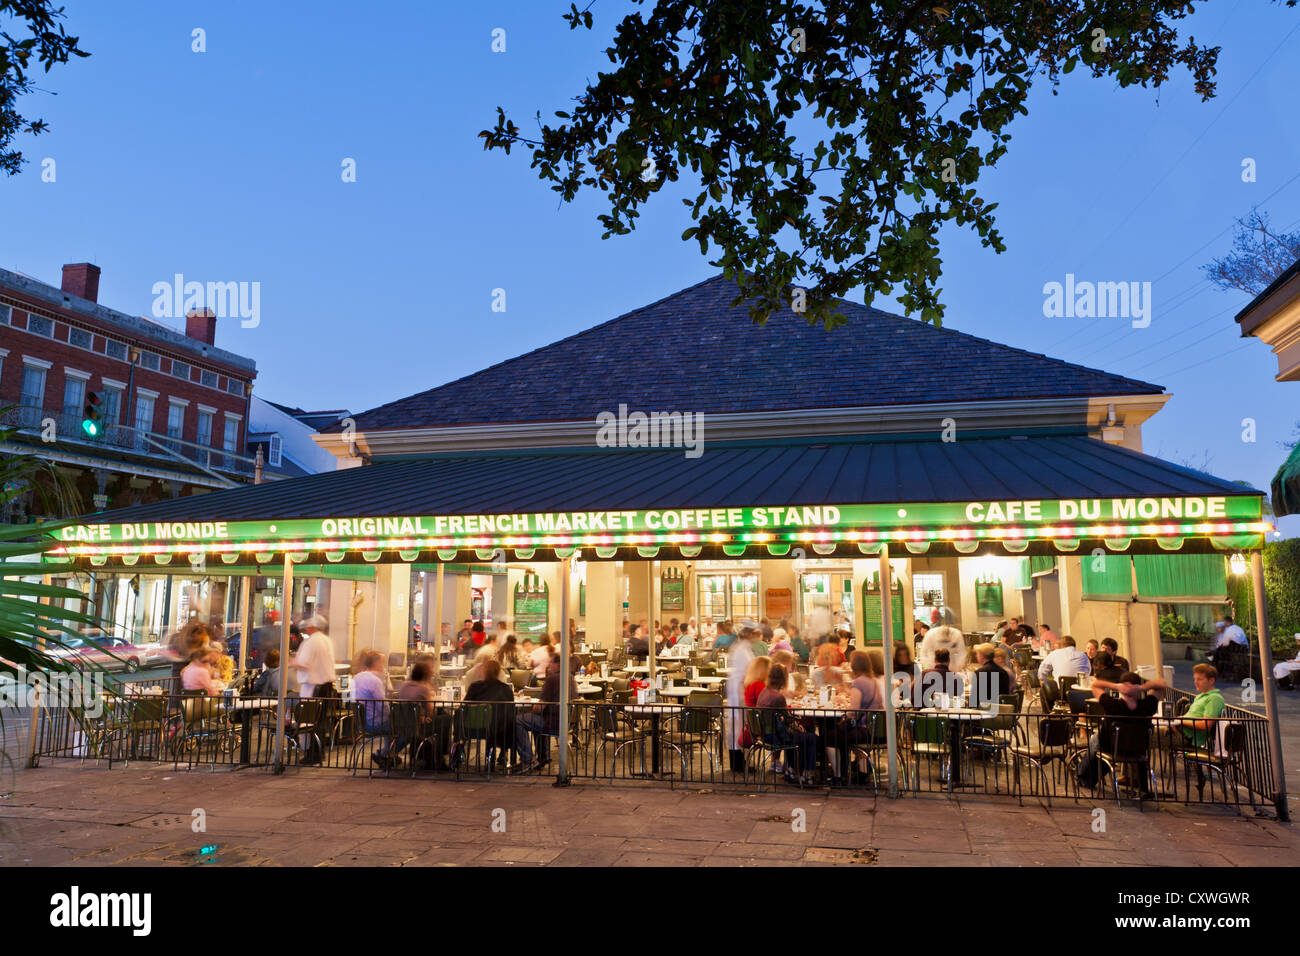 Cafe Du Monde Coffee Stand